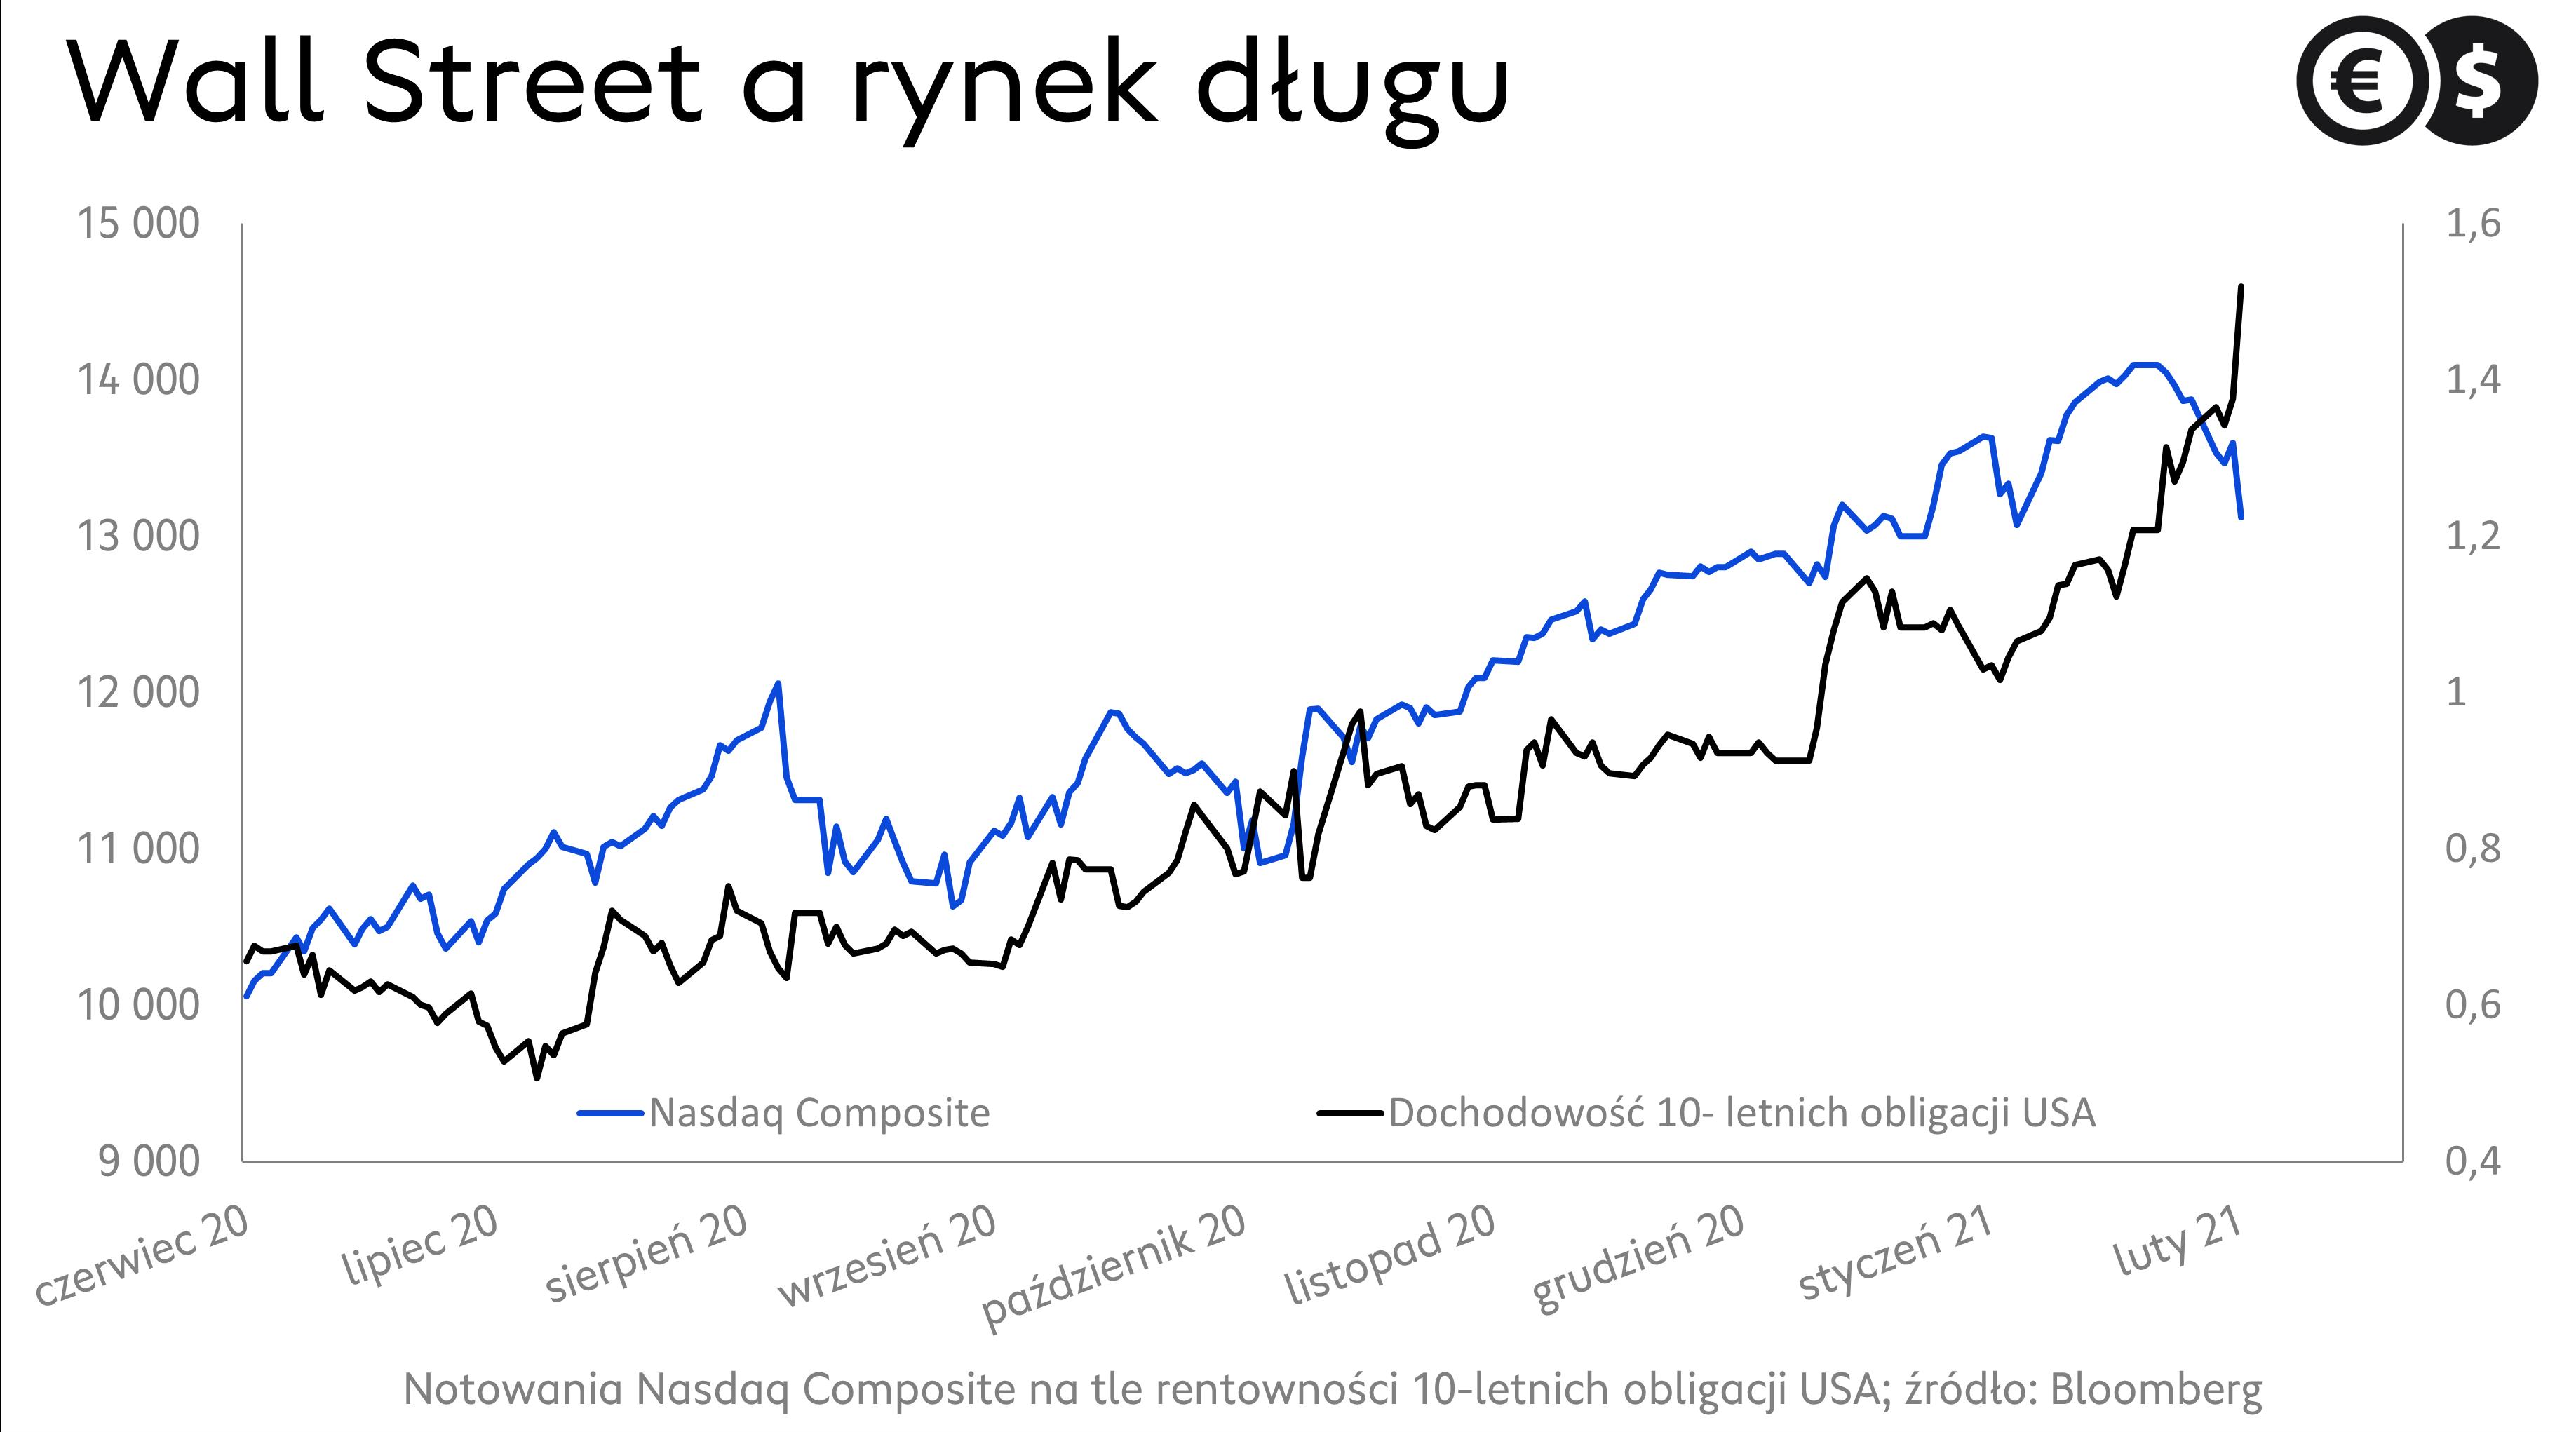 Wall Street a rynek długu